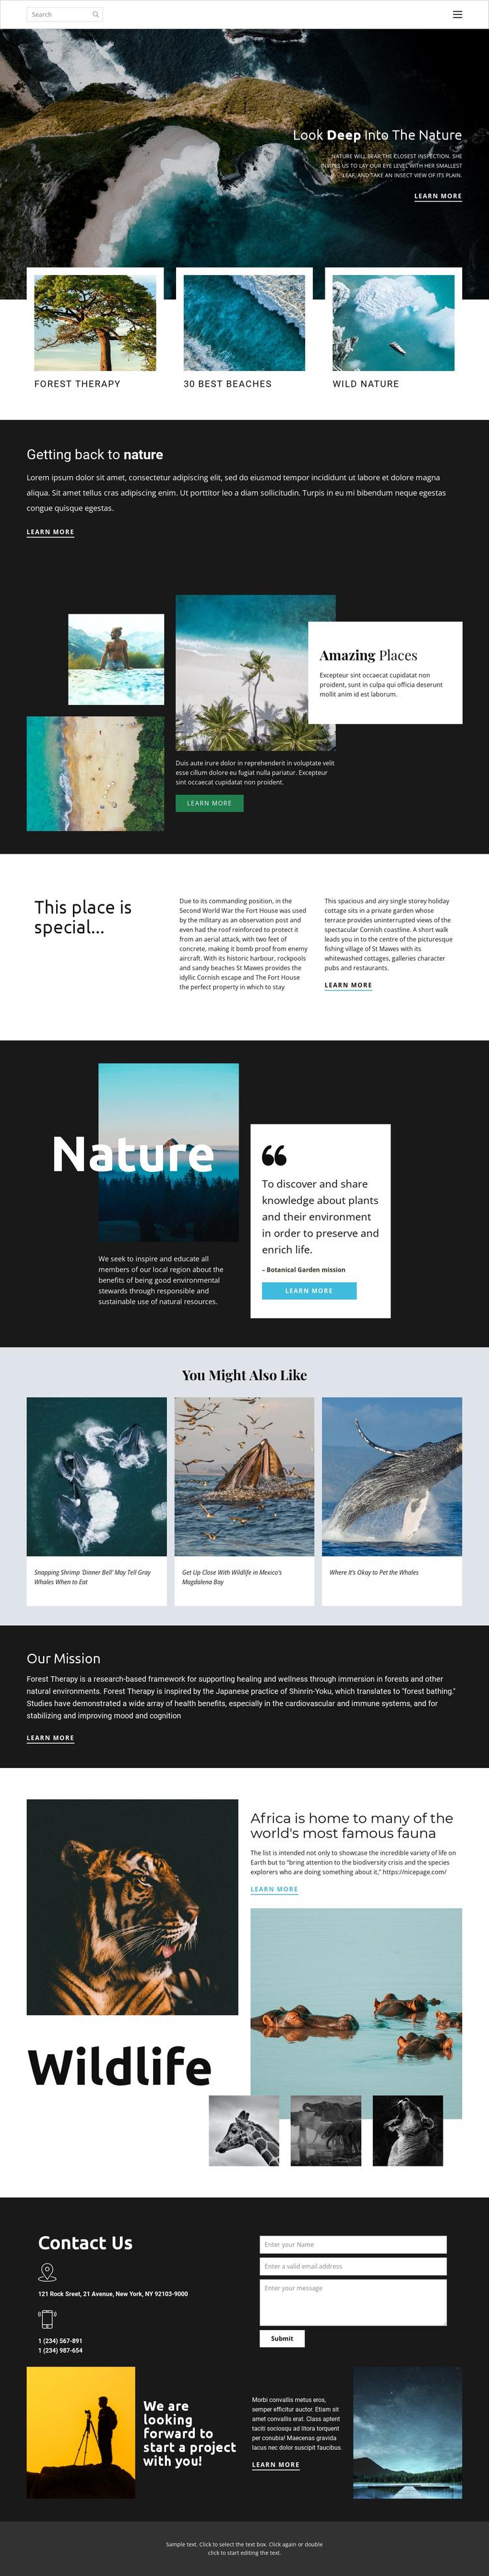 Exploring wildlife and nature Joomla Template